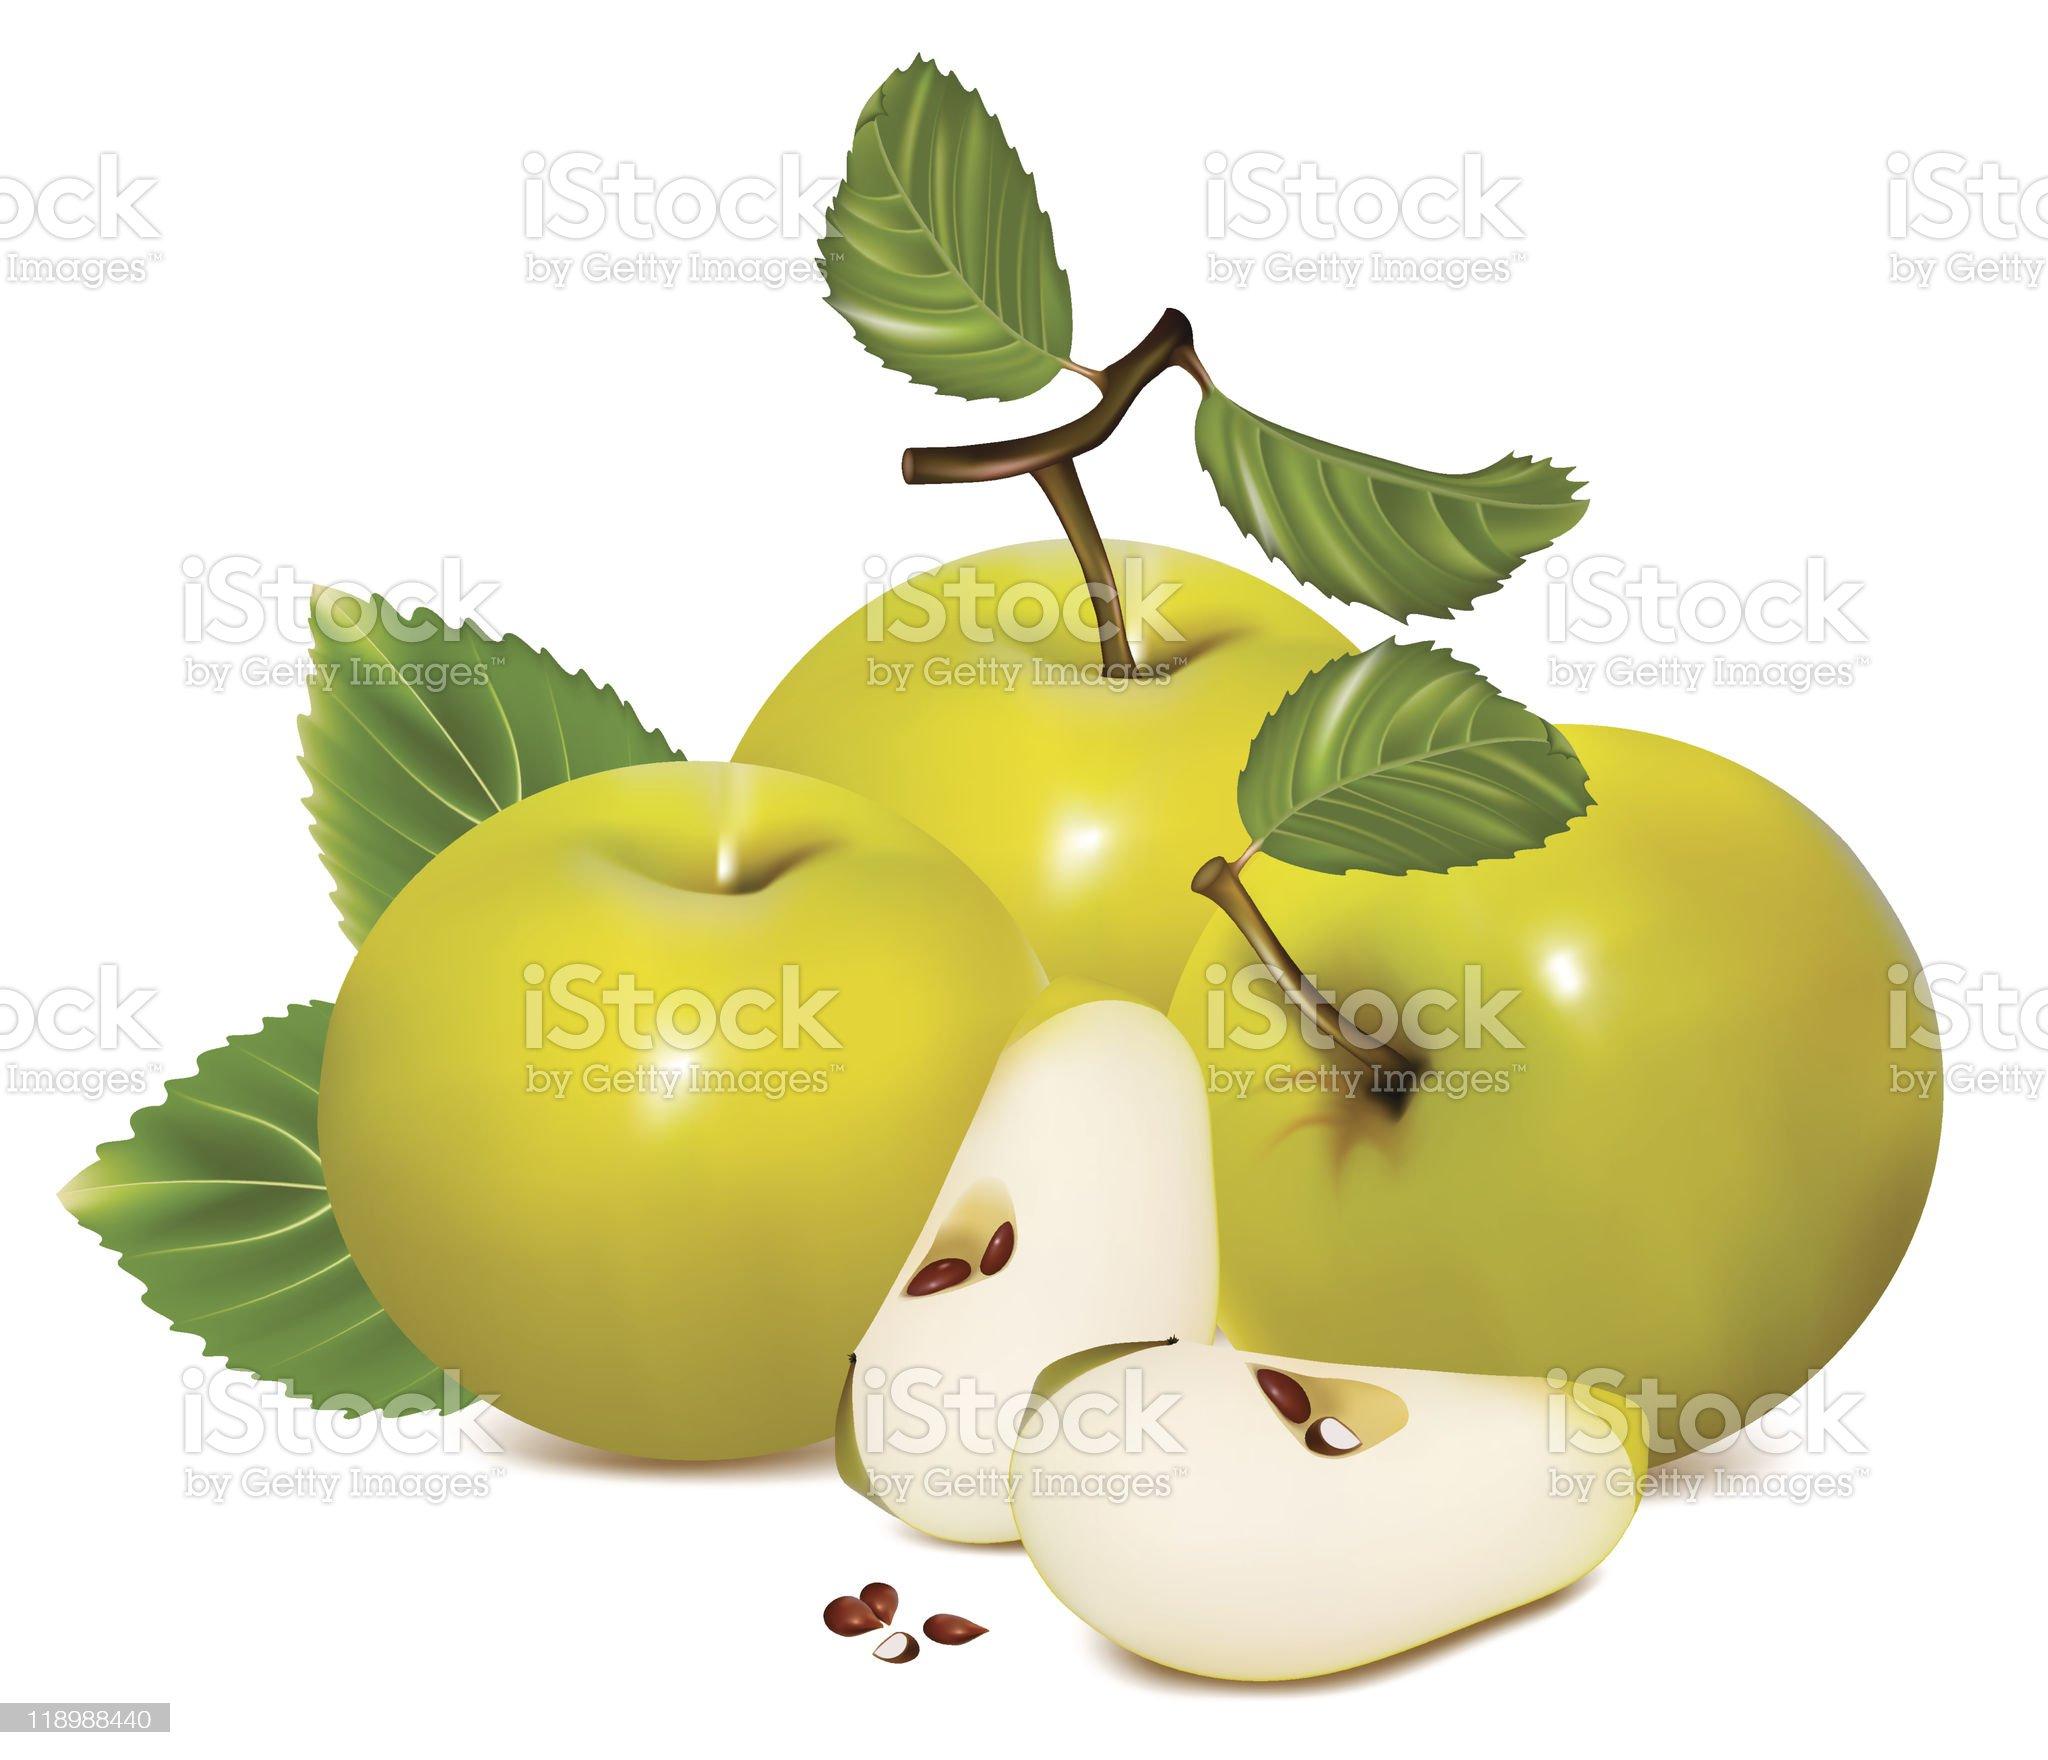 Green apples. royalty-free stock vector art